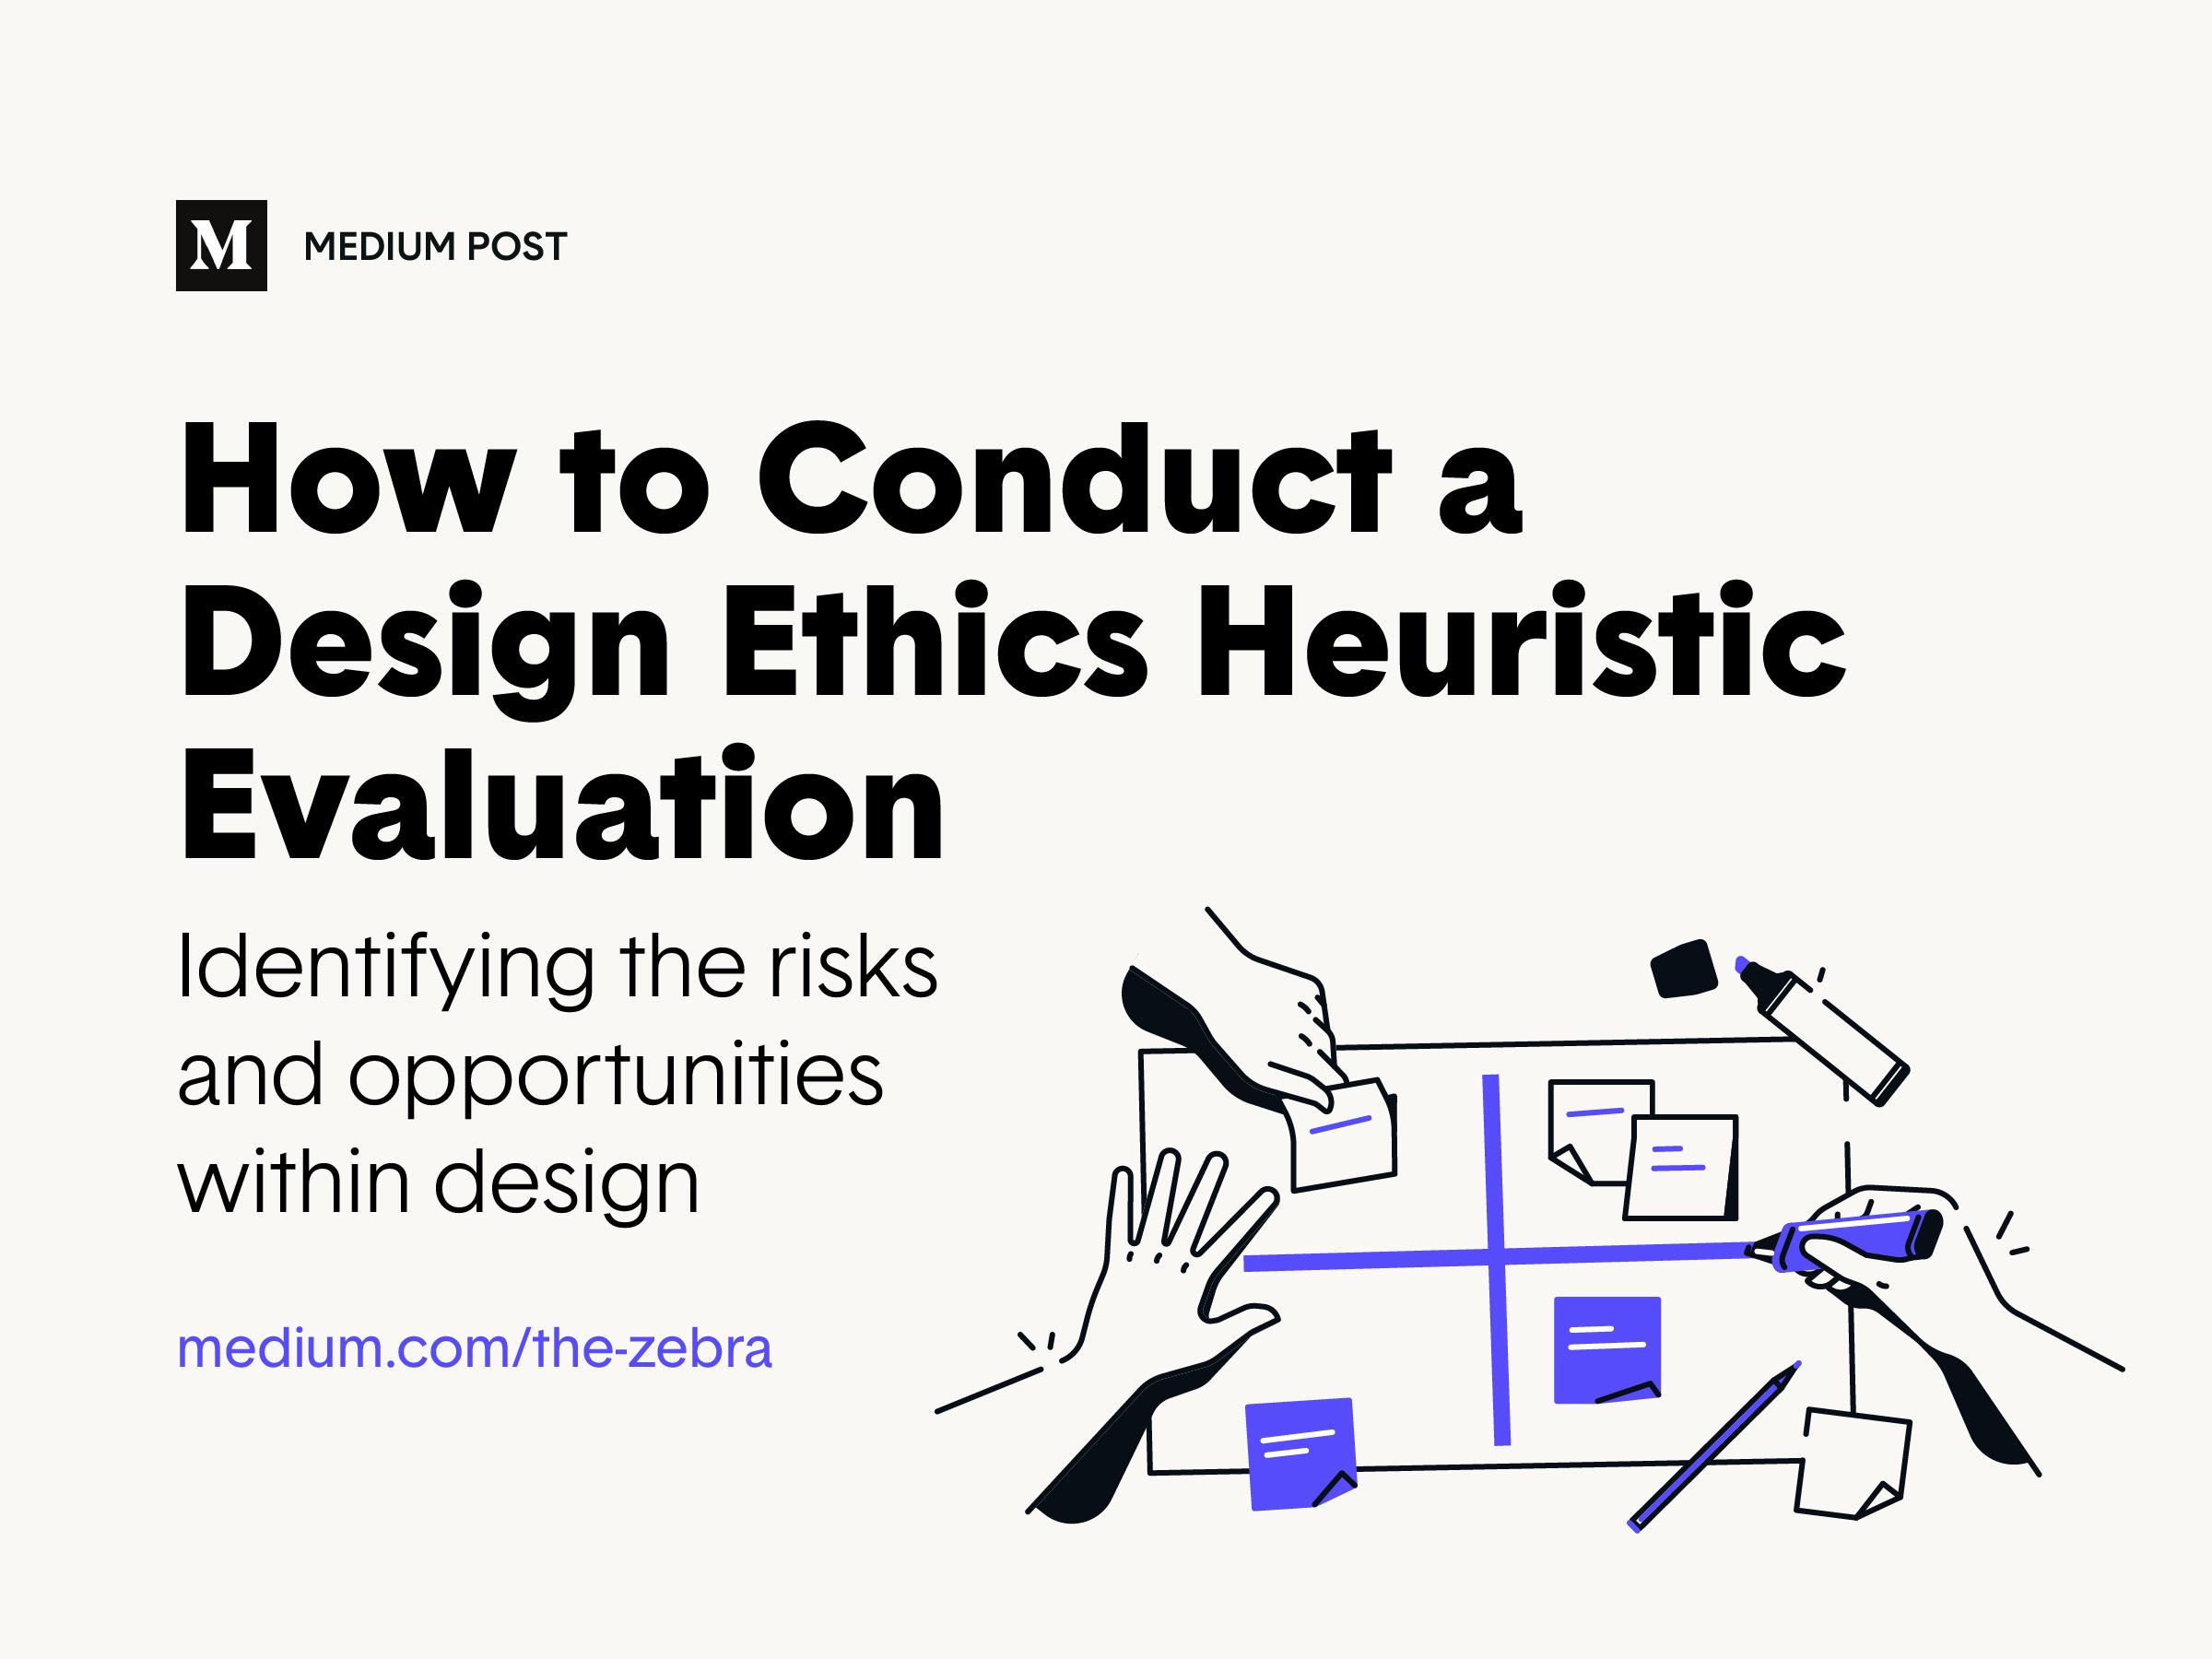 V2design ethics heuristics evaluation dribbble2 3x